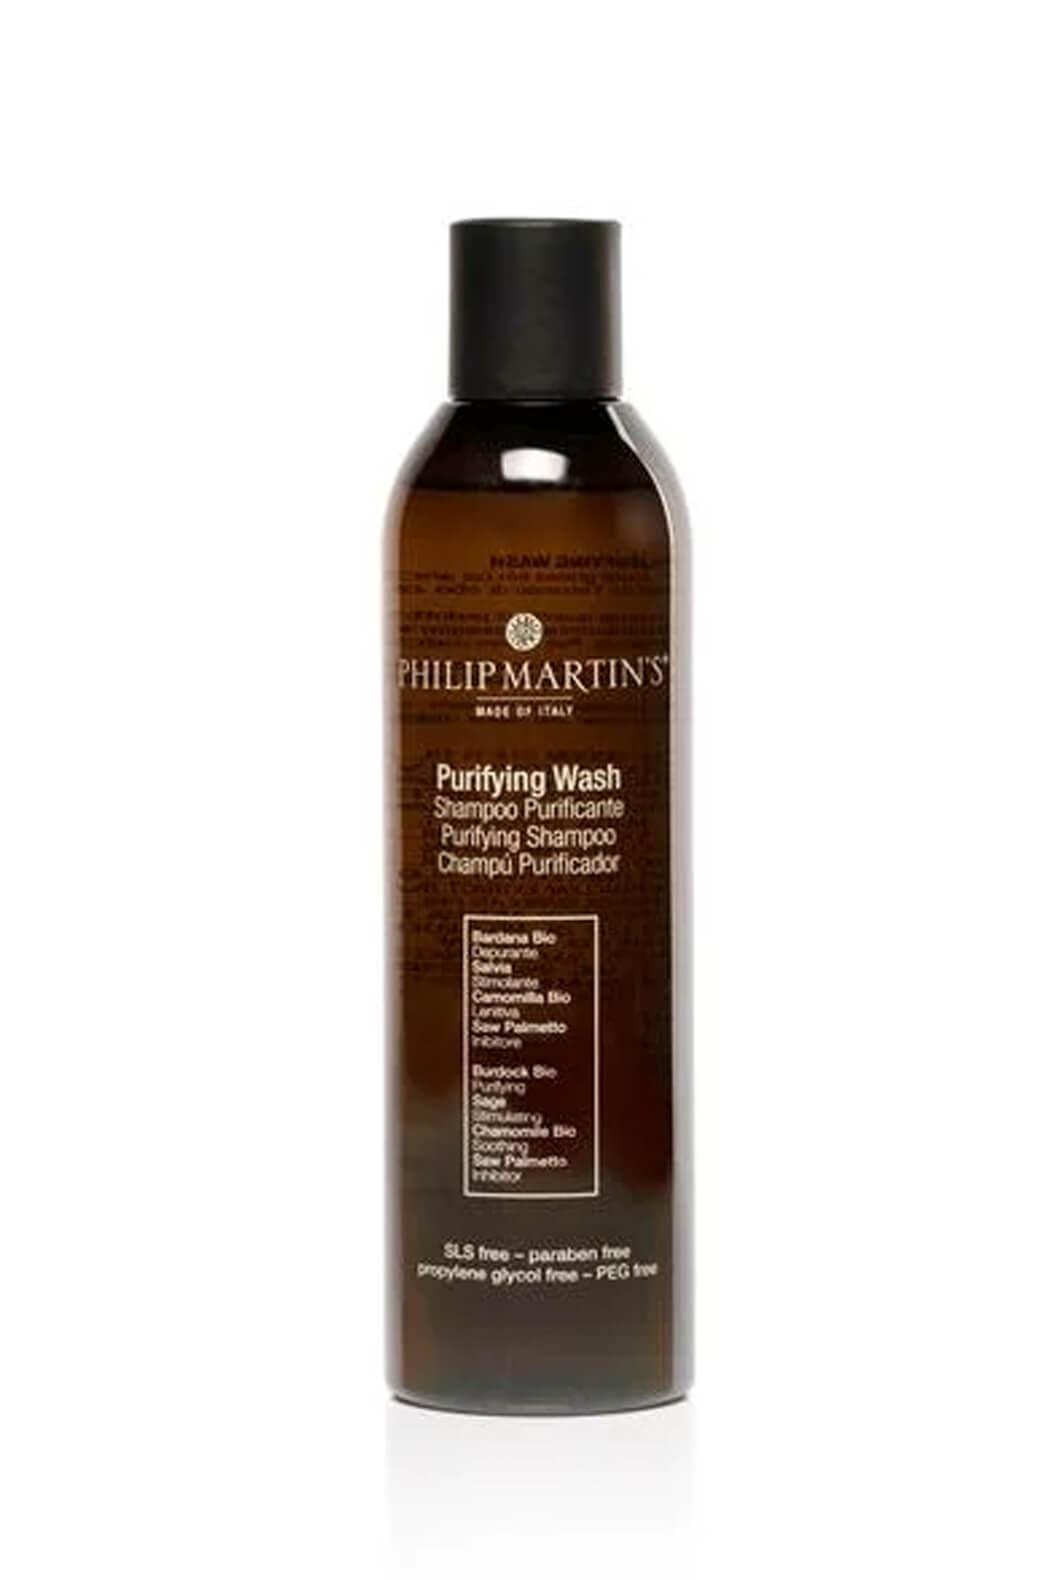 Philip-Martins-Purifying-Wash |Konzept H